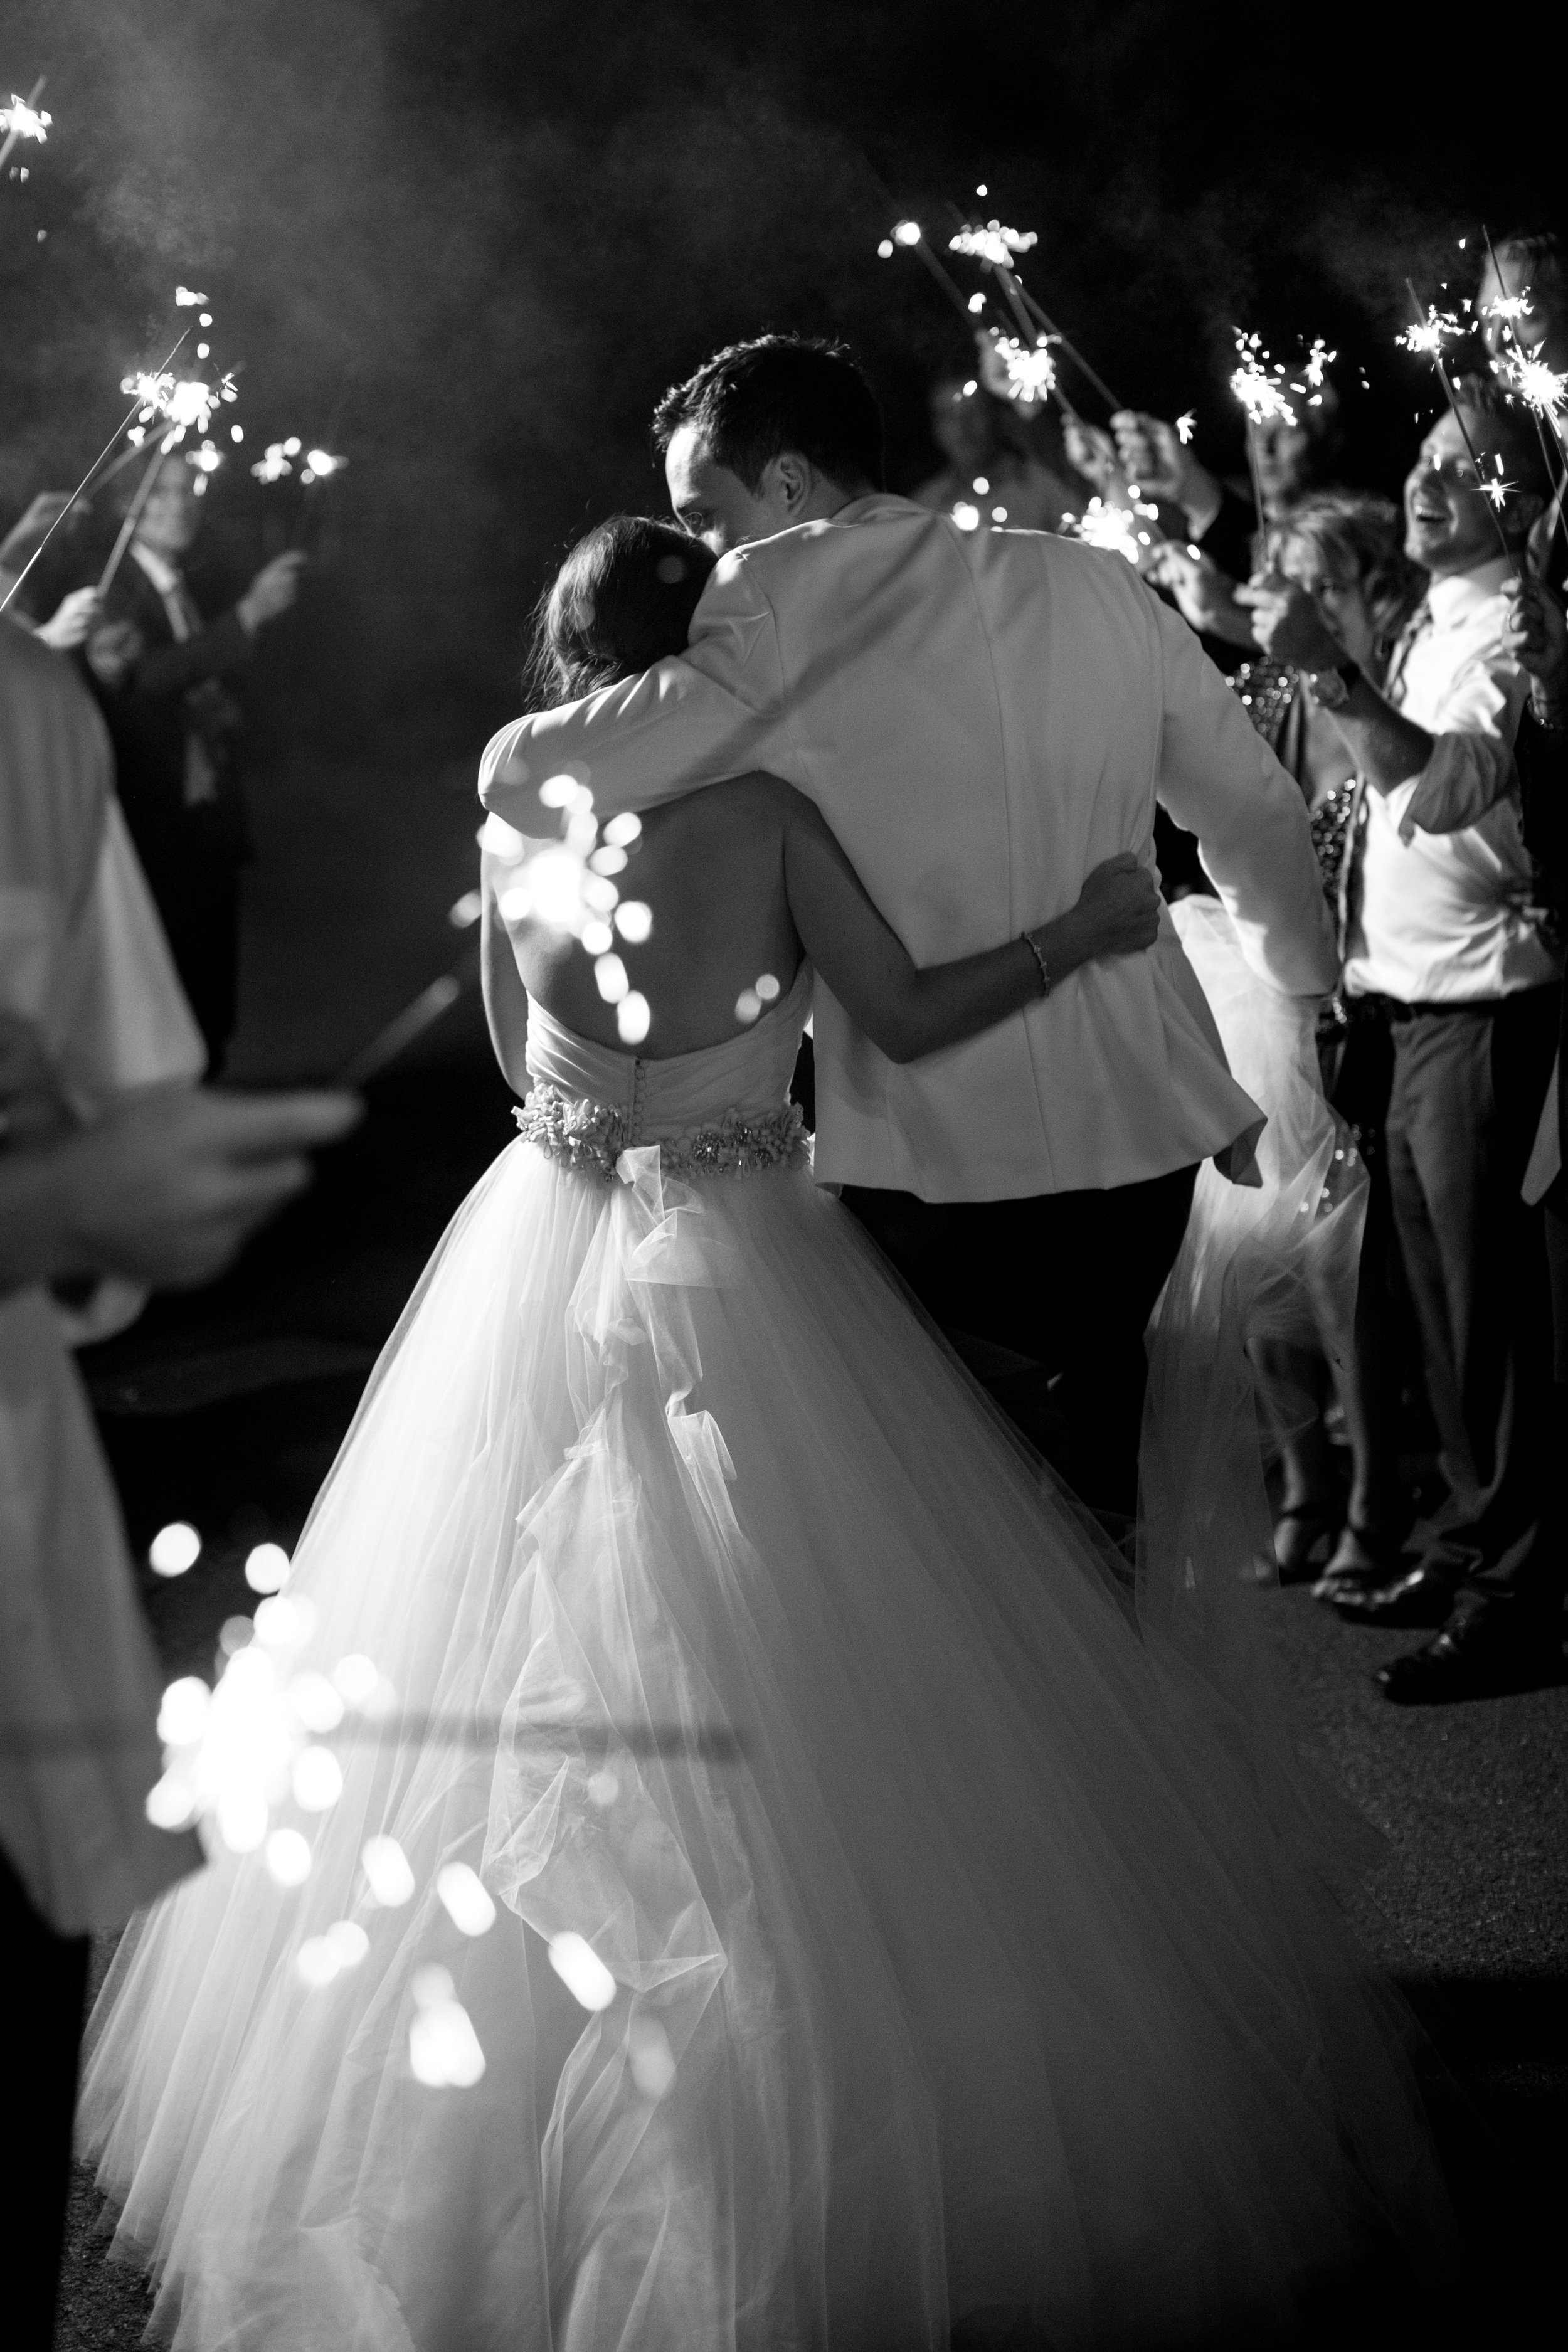 09-09-17-Kady-and-Kyle-Wedding-Photos-by-Liz-and-Ryan-1668.jpg